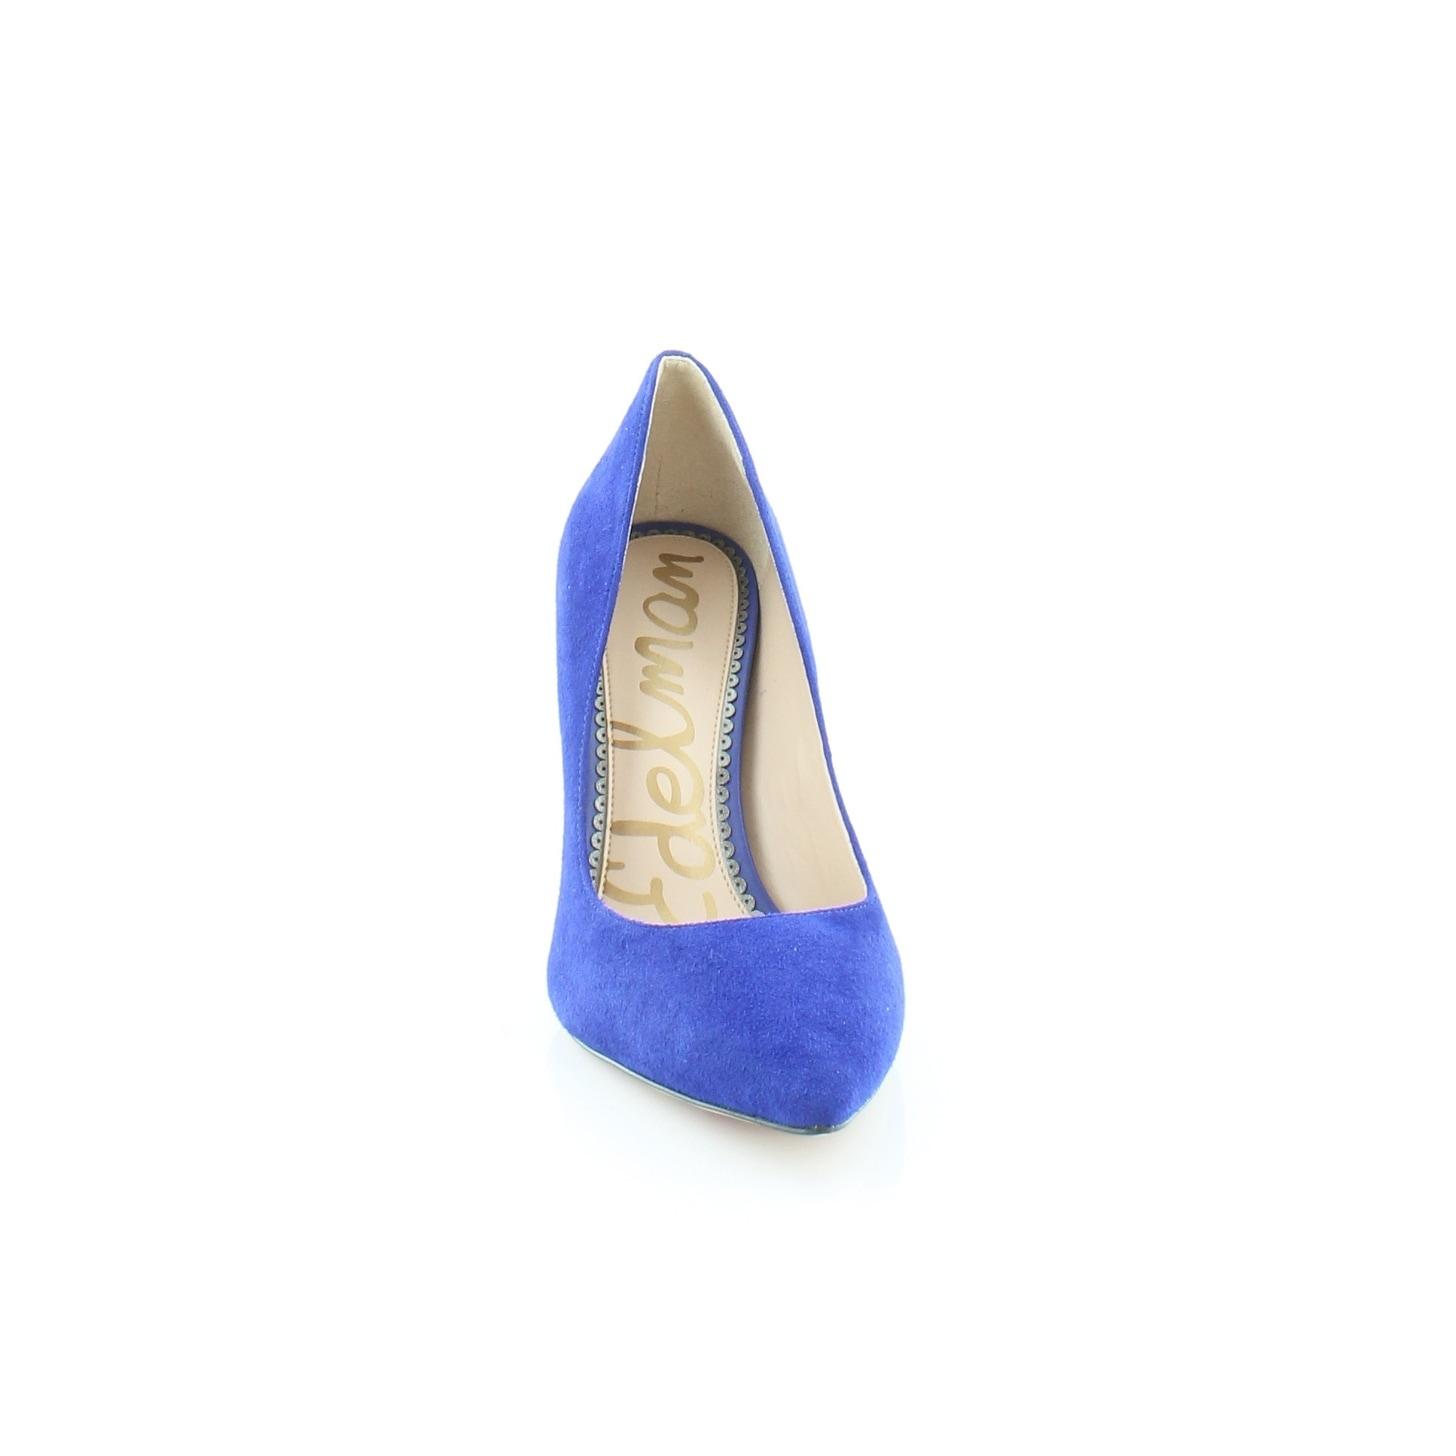 1aef01cd960cd4 Shop Sam Edelman Hazel Women s Heels Deep Blue - Free Shipping Today -  Overstock - 25582819